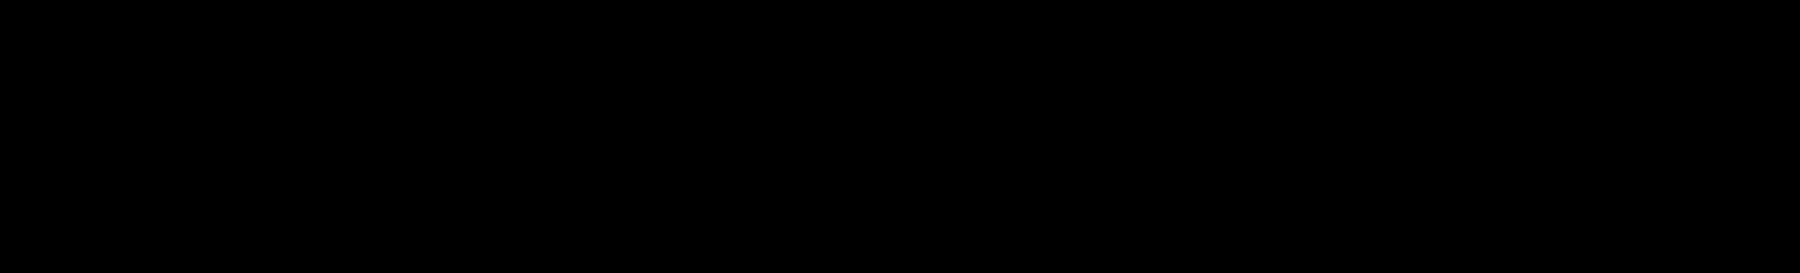 atomized-logo-v2-black.png